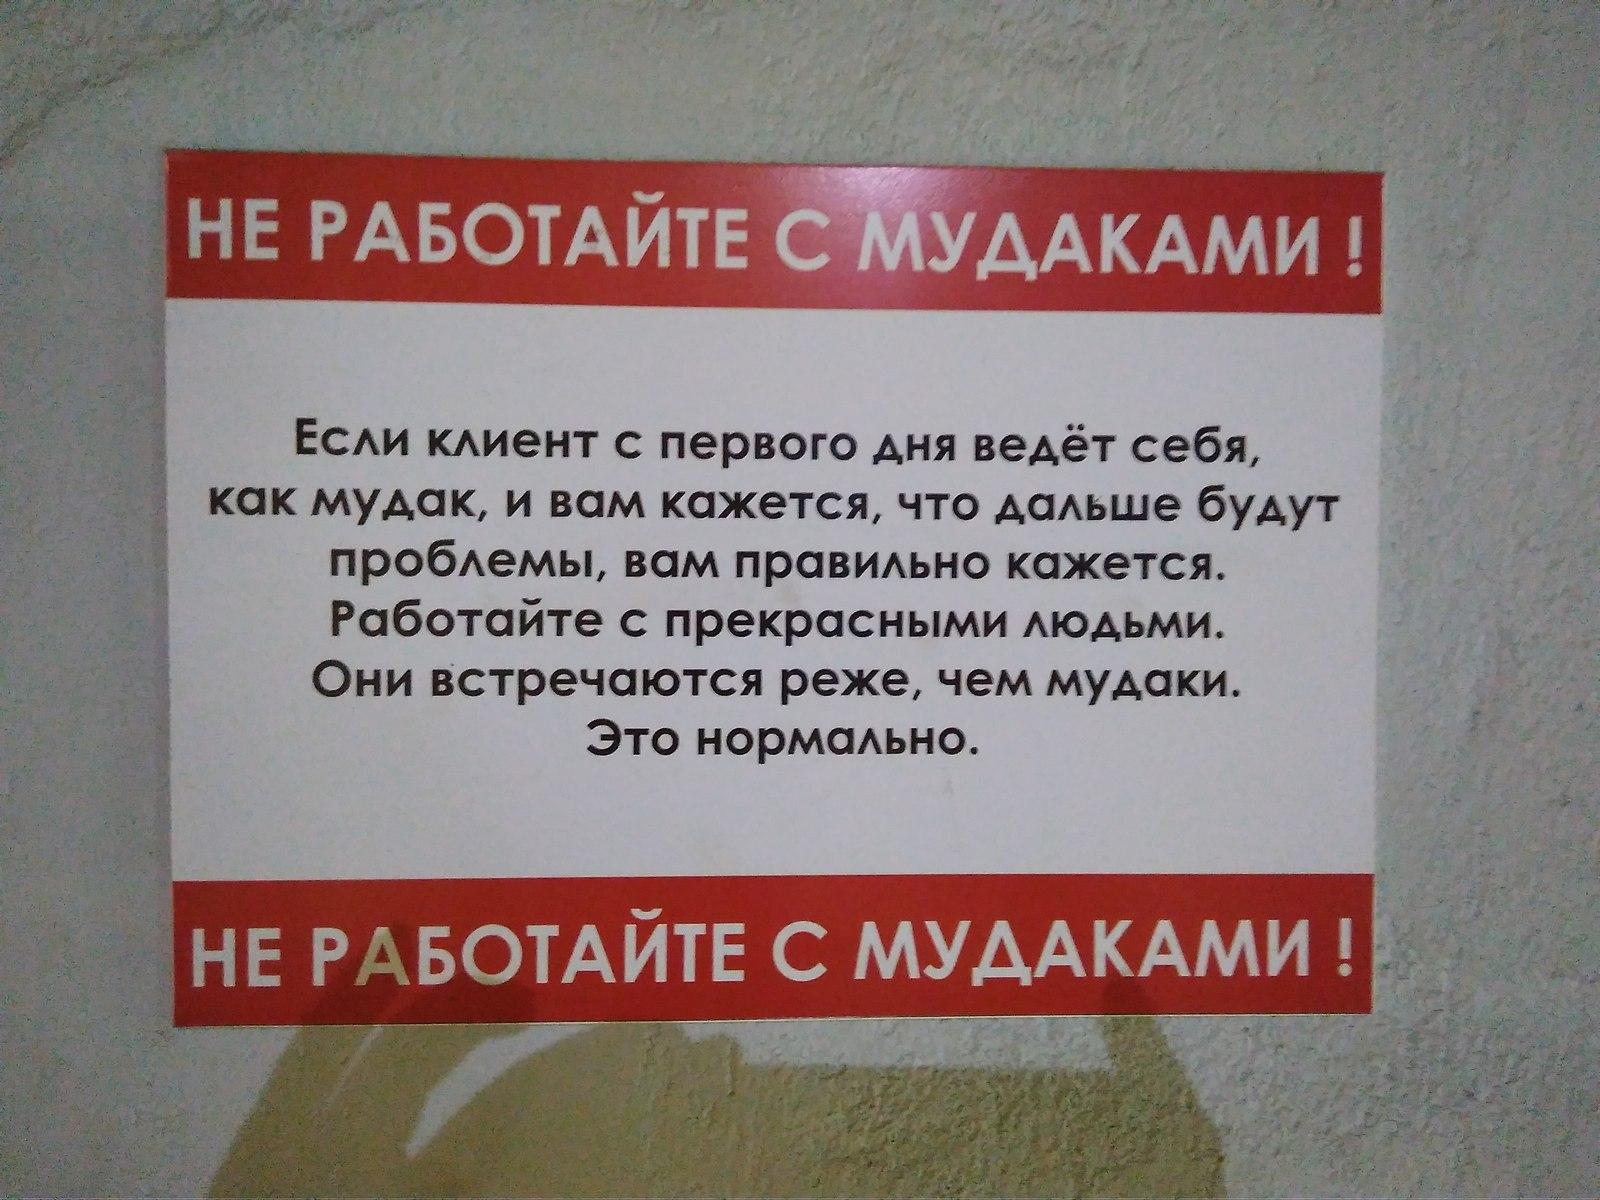 https://cs8.pikabu.ru/post_img/big/2017/12/07/8/1512648451125916517.jpg